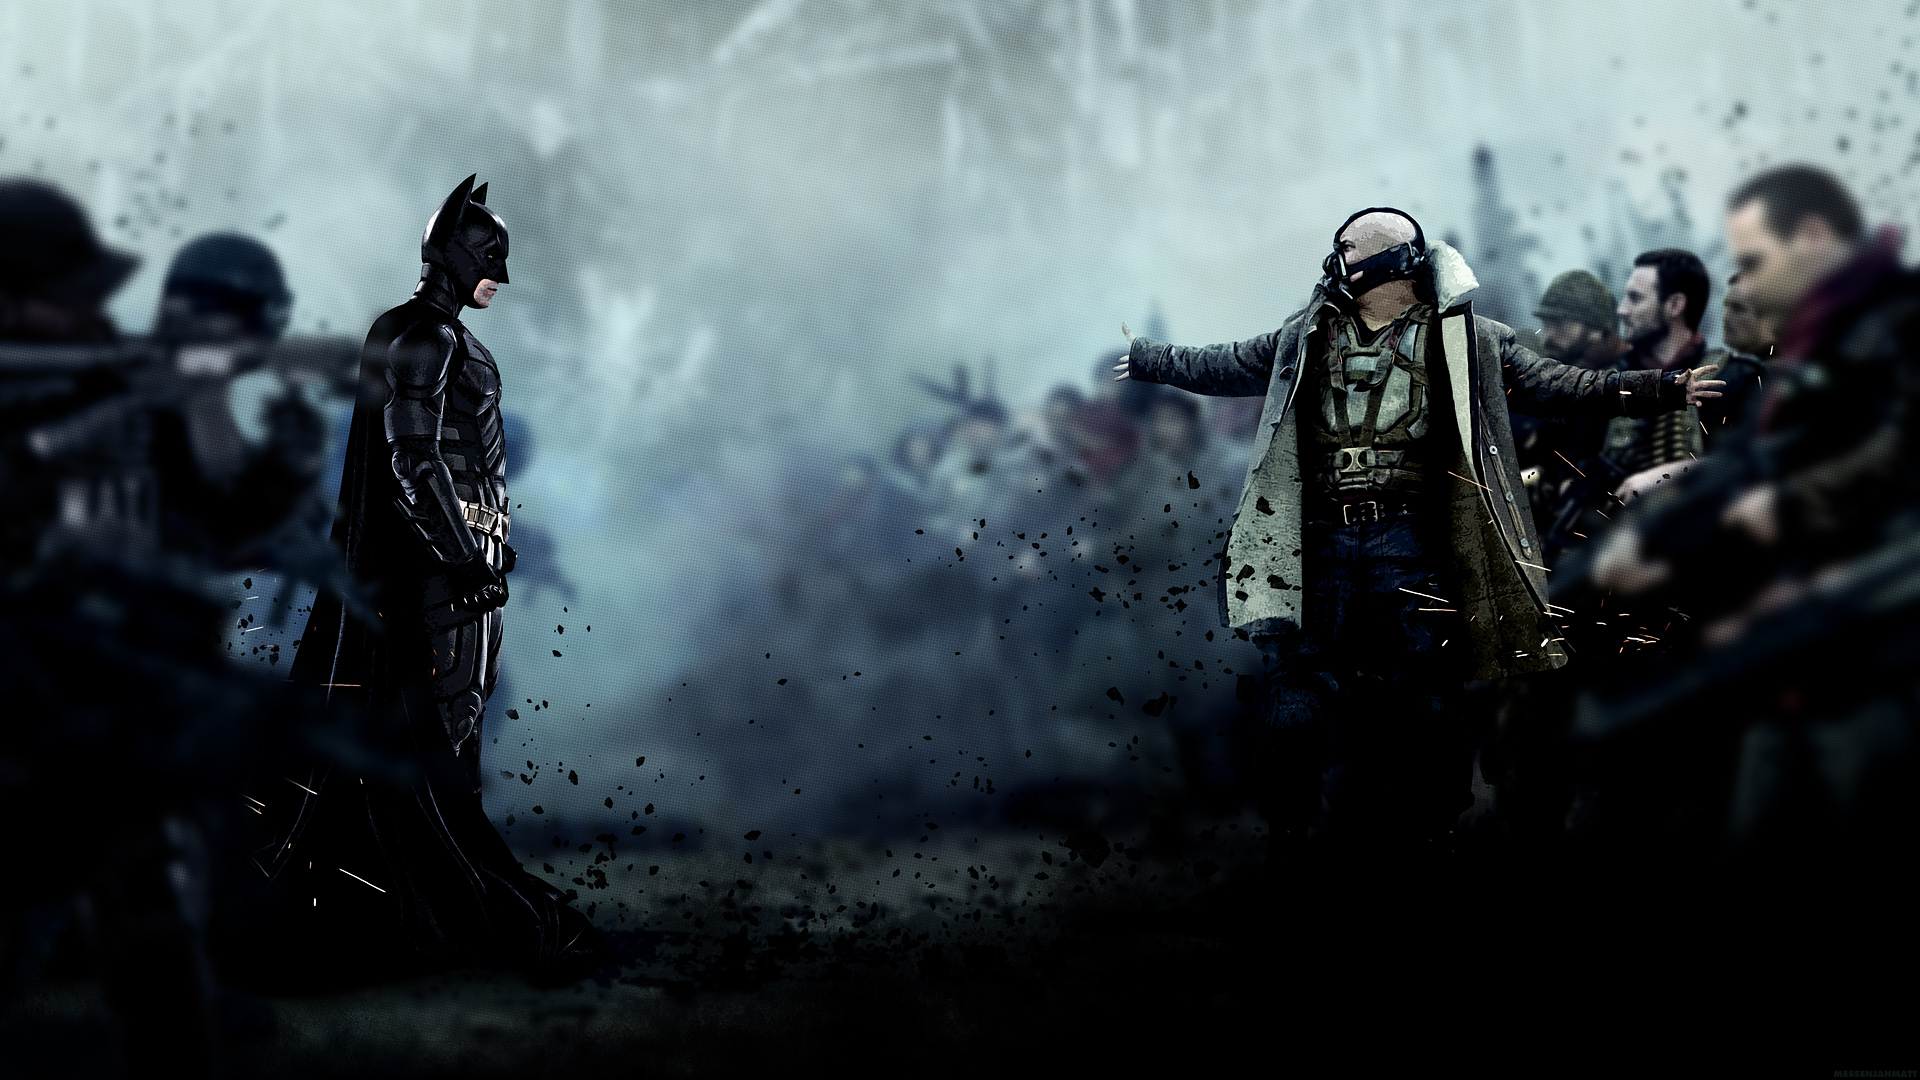 DARK KNIGHT RISES batman superhero bane hd wallpaper 1920x1080 1920x1080